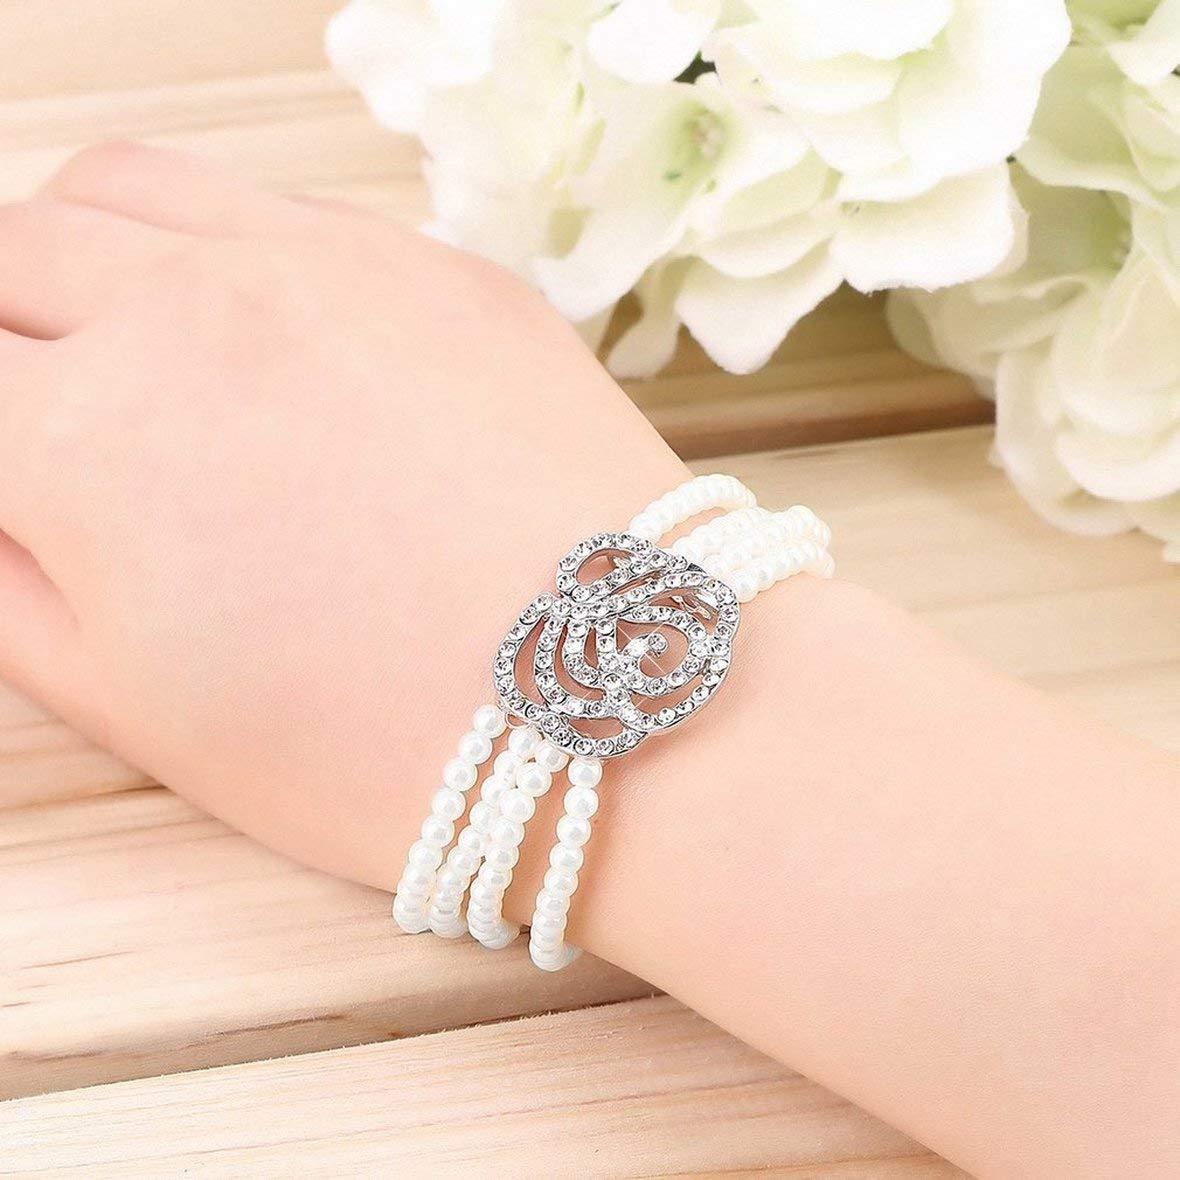 Tivolii Fashionable Elegant Popular Womens Elegant 4 Layer Crystal Rose Flower Simulated Pearl Bangle Strand Bracelet Accessories Stylish